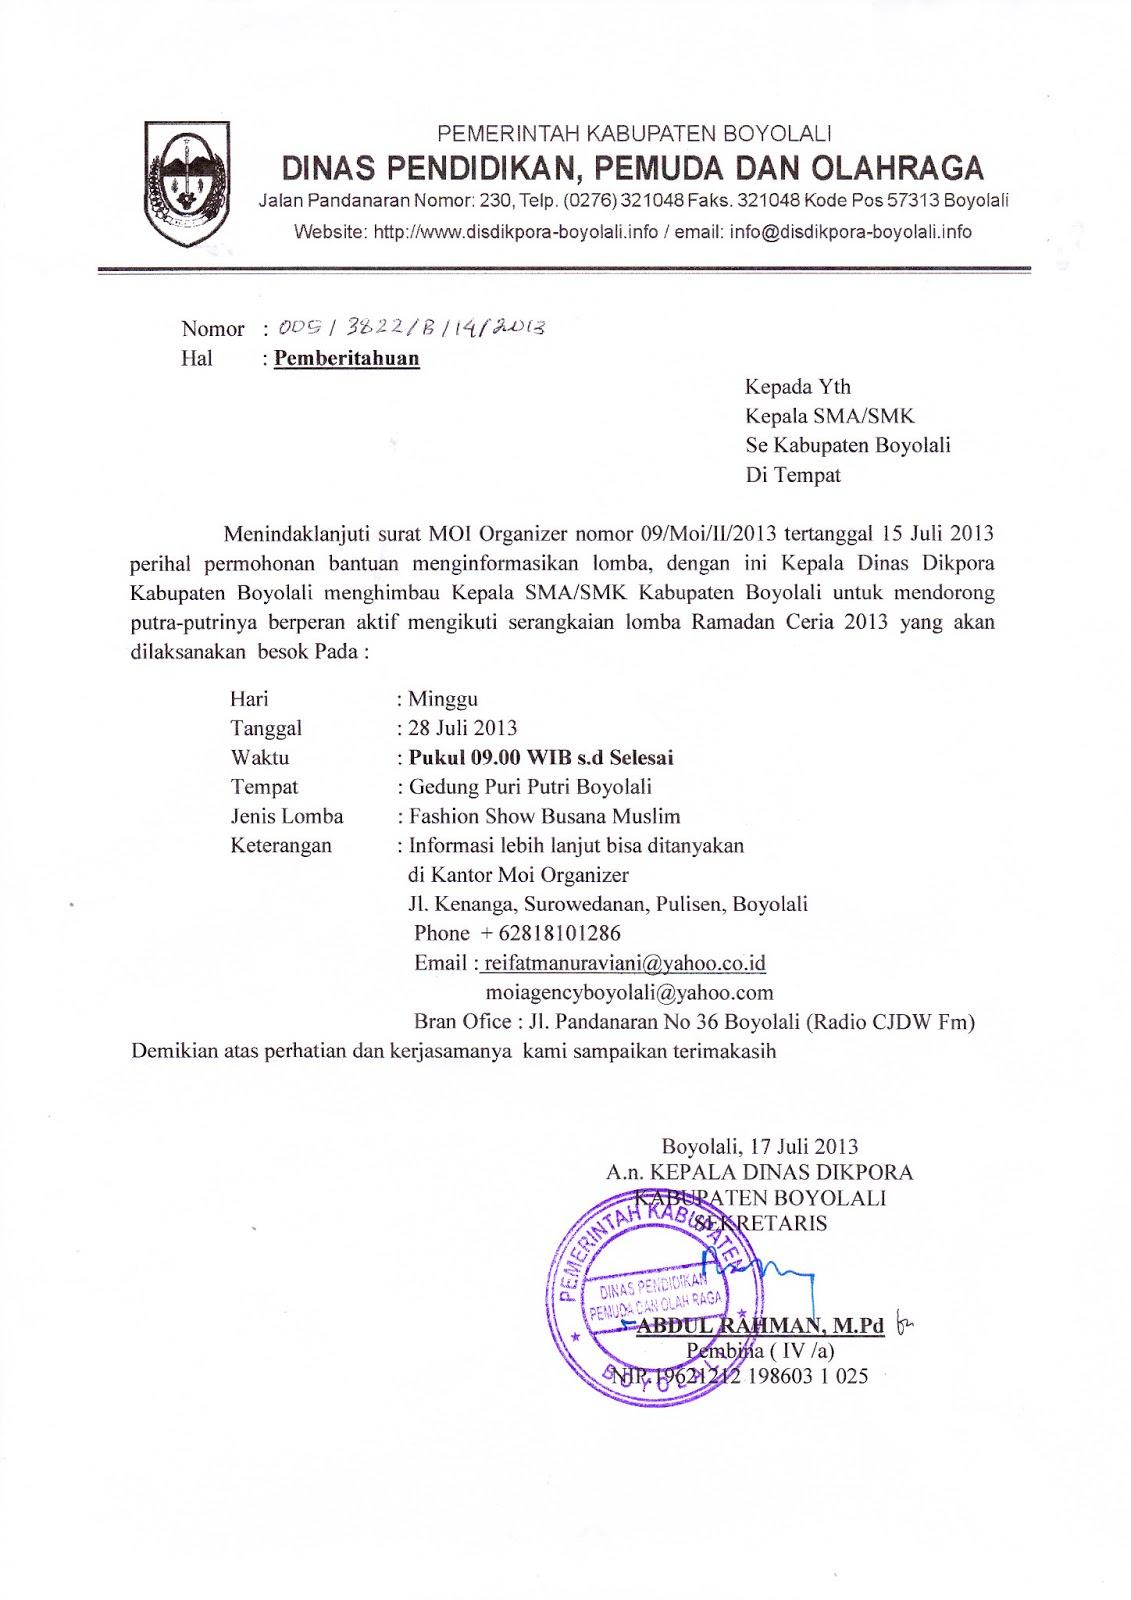 Info Sma Smk Kabupaten Boyolali Surat Permohonan